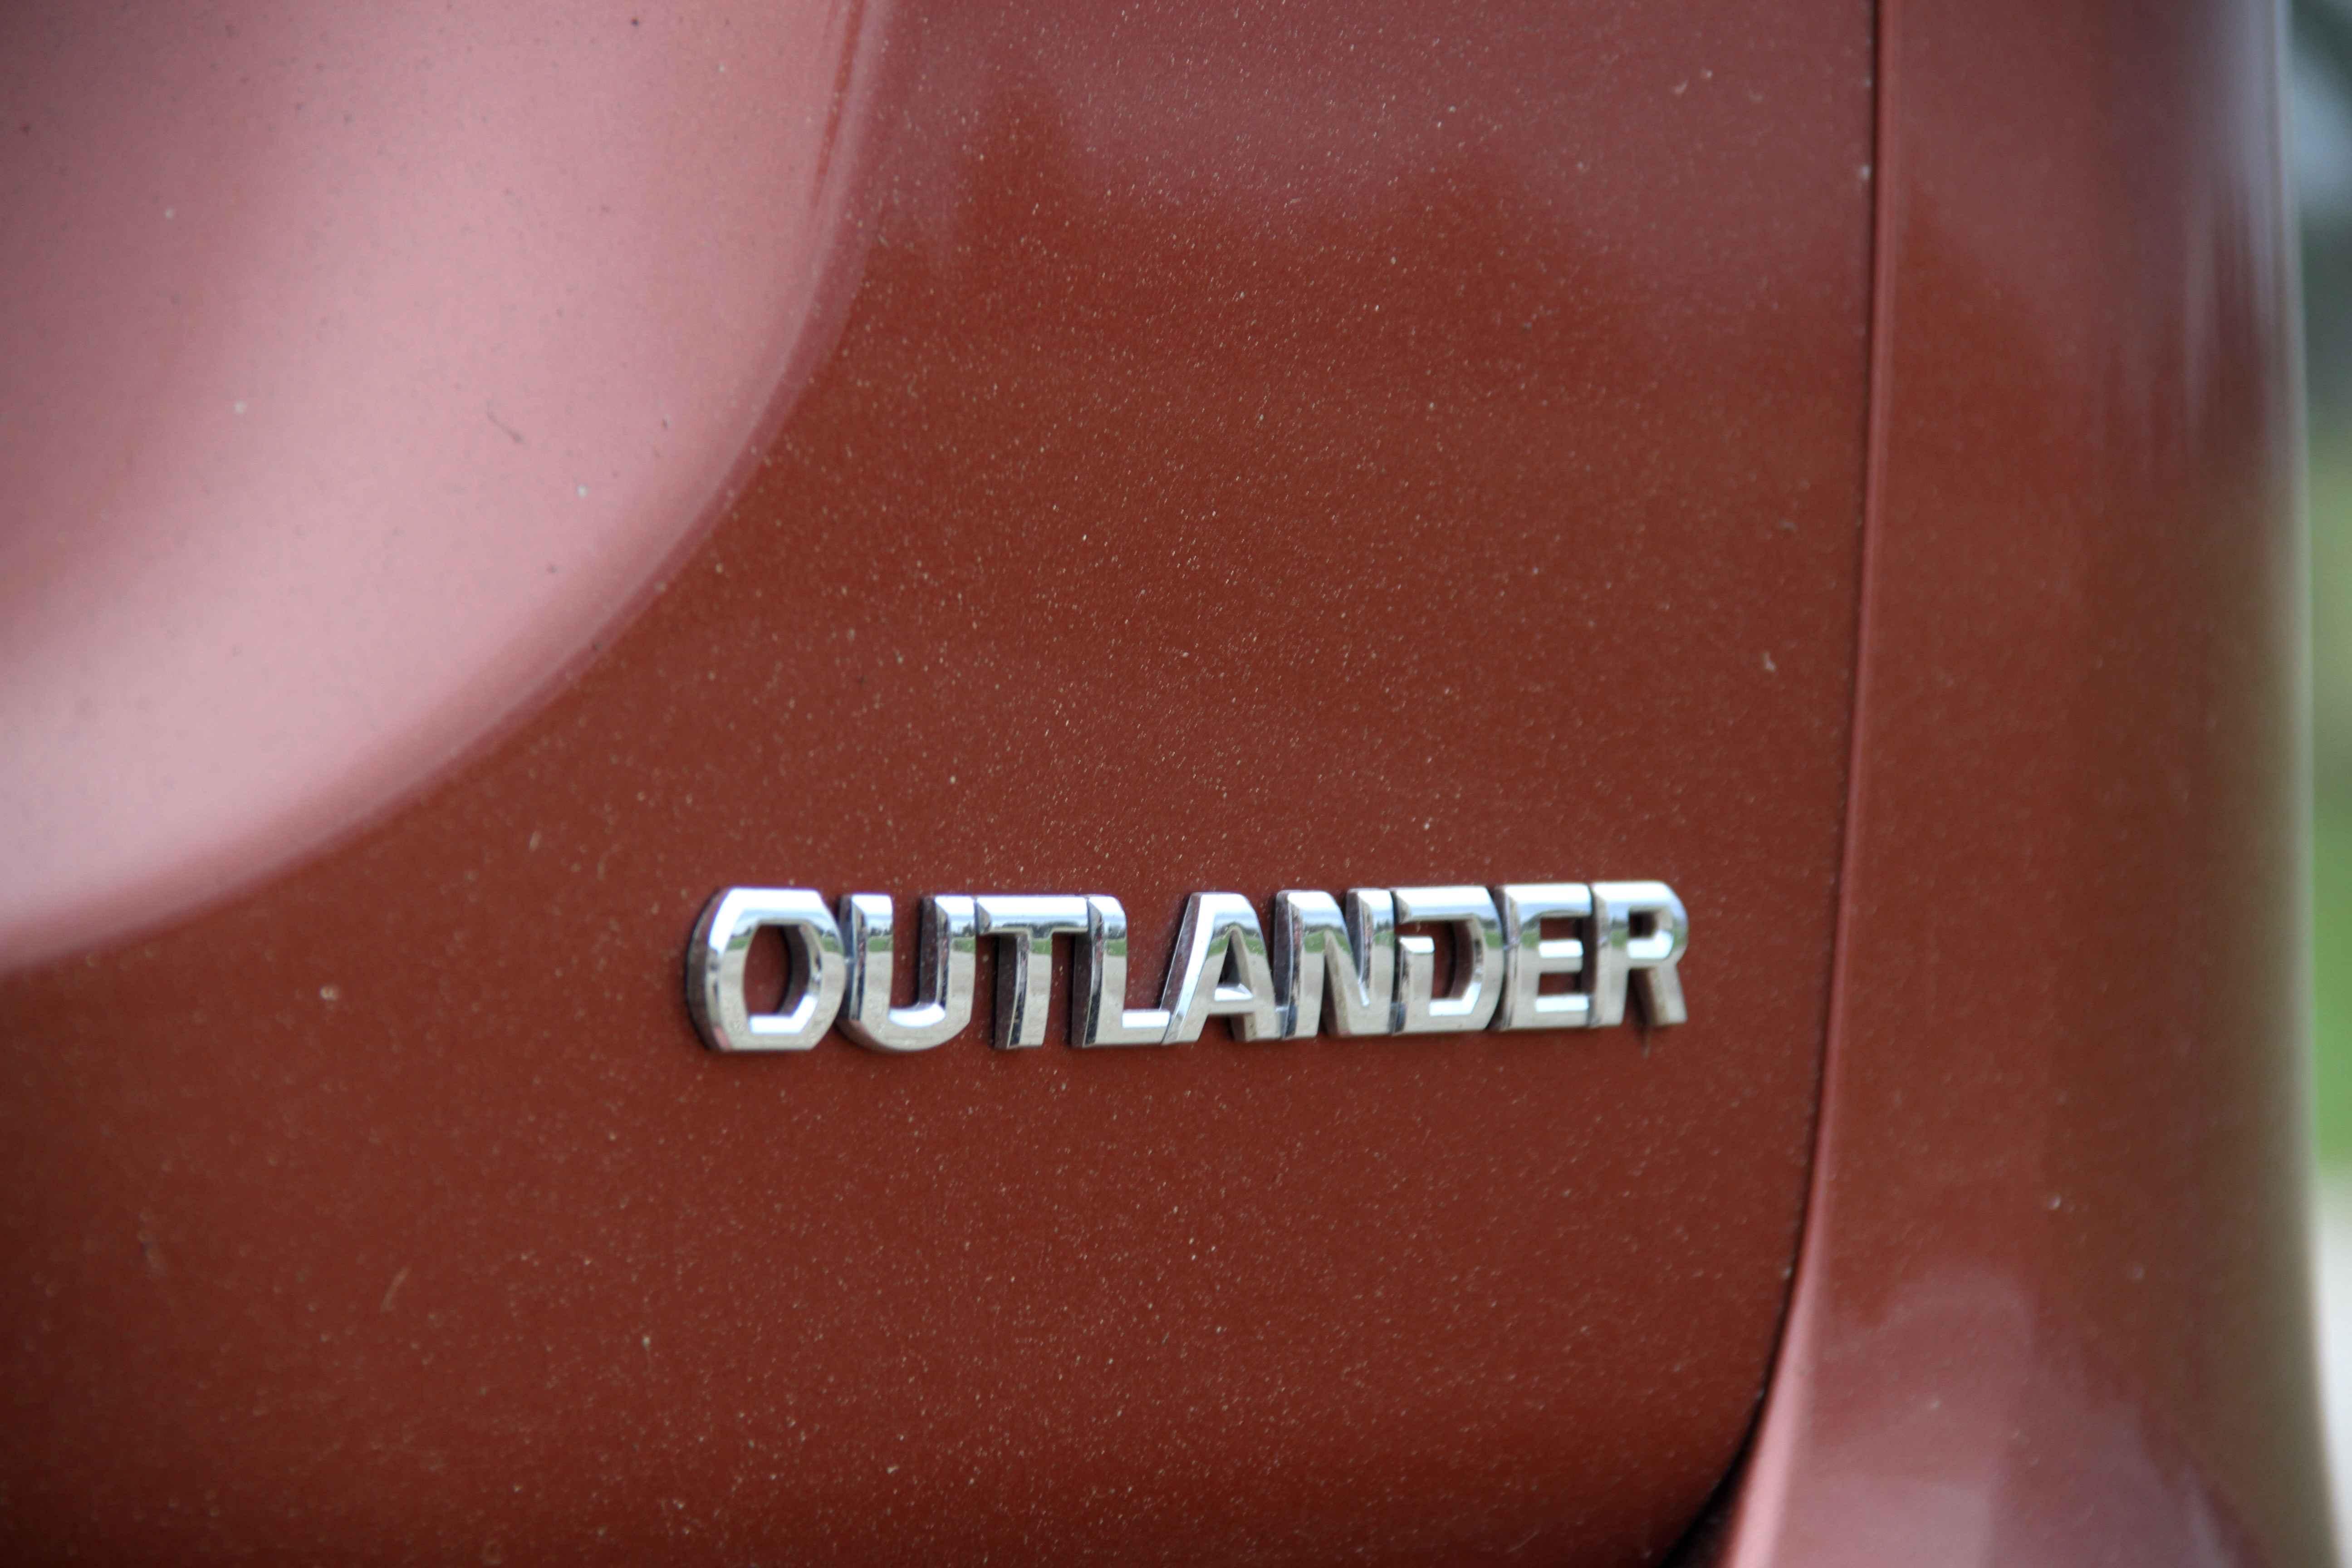 Mitsubishi Outlander 2013 Badge